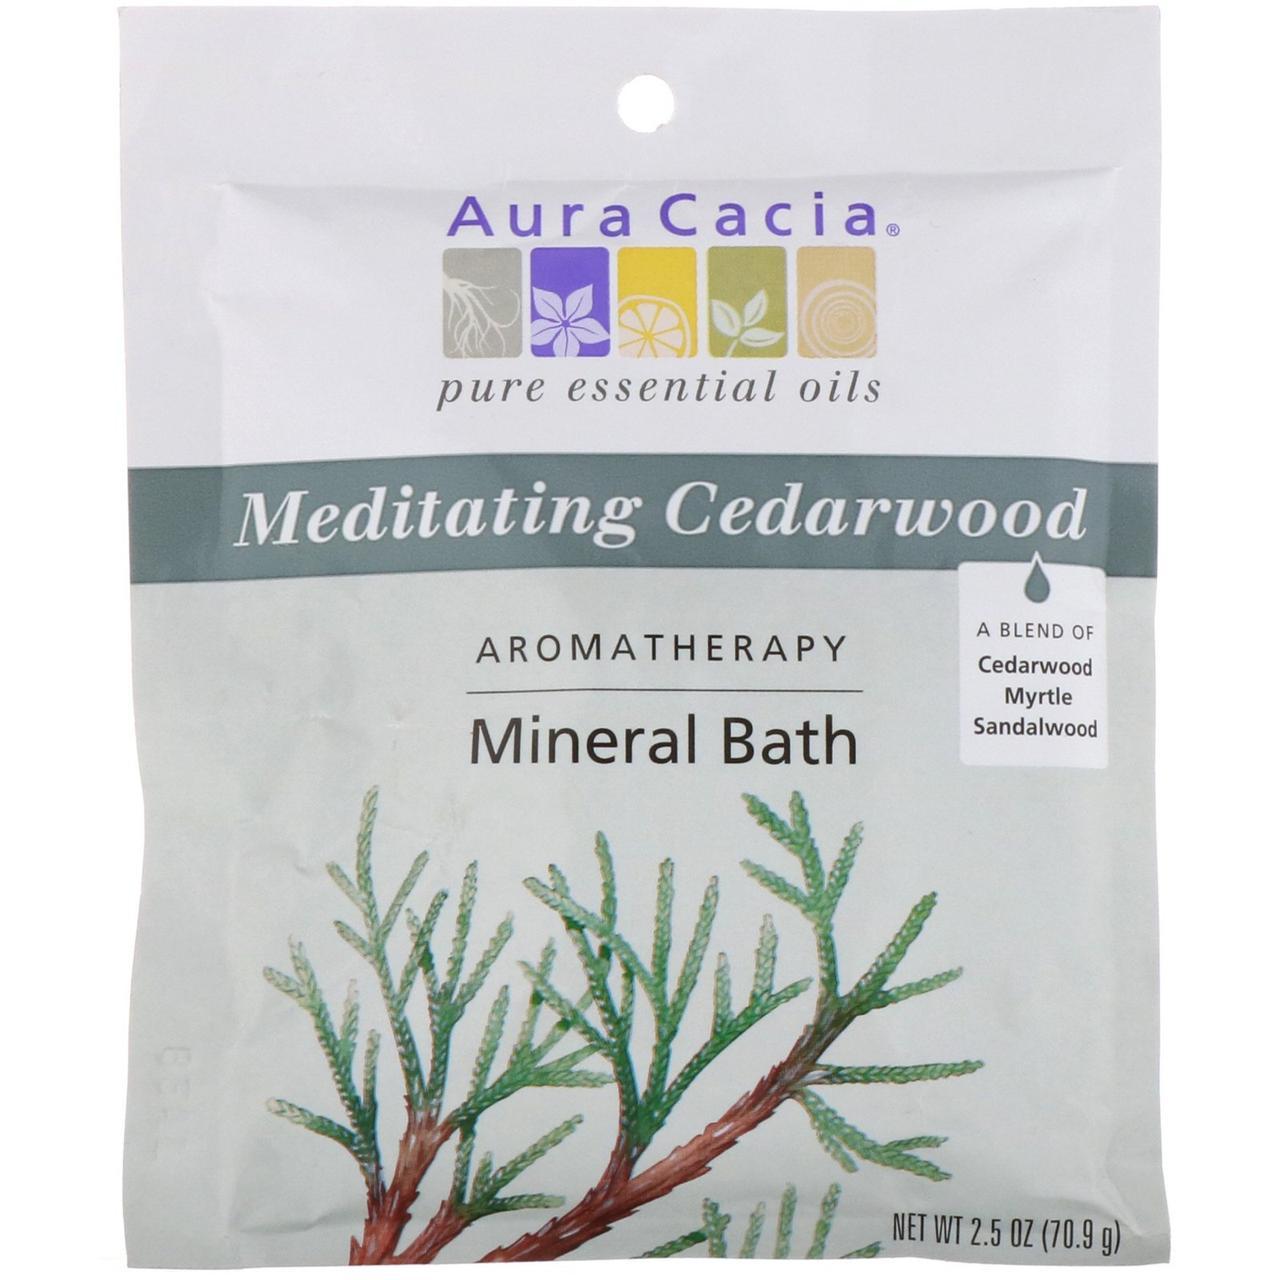 Соли для ванн (кедровое дерево), Mineral Bath, Aura Cacia, 70,9 г